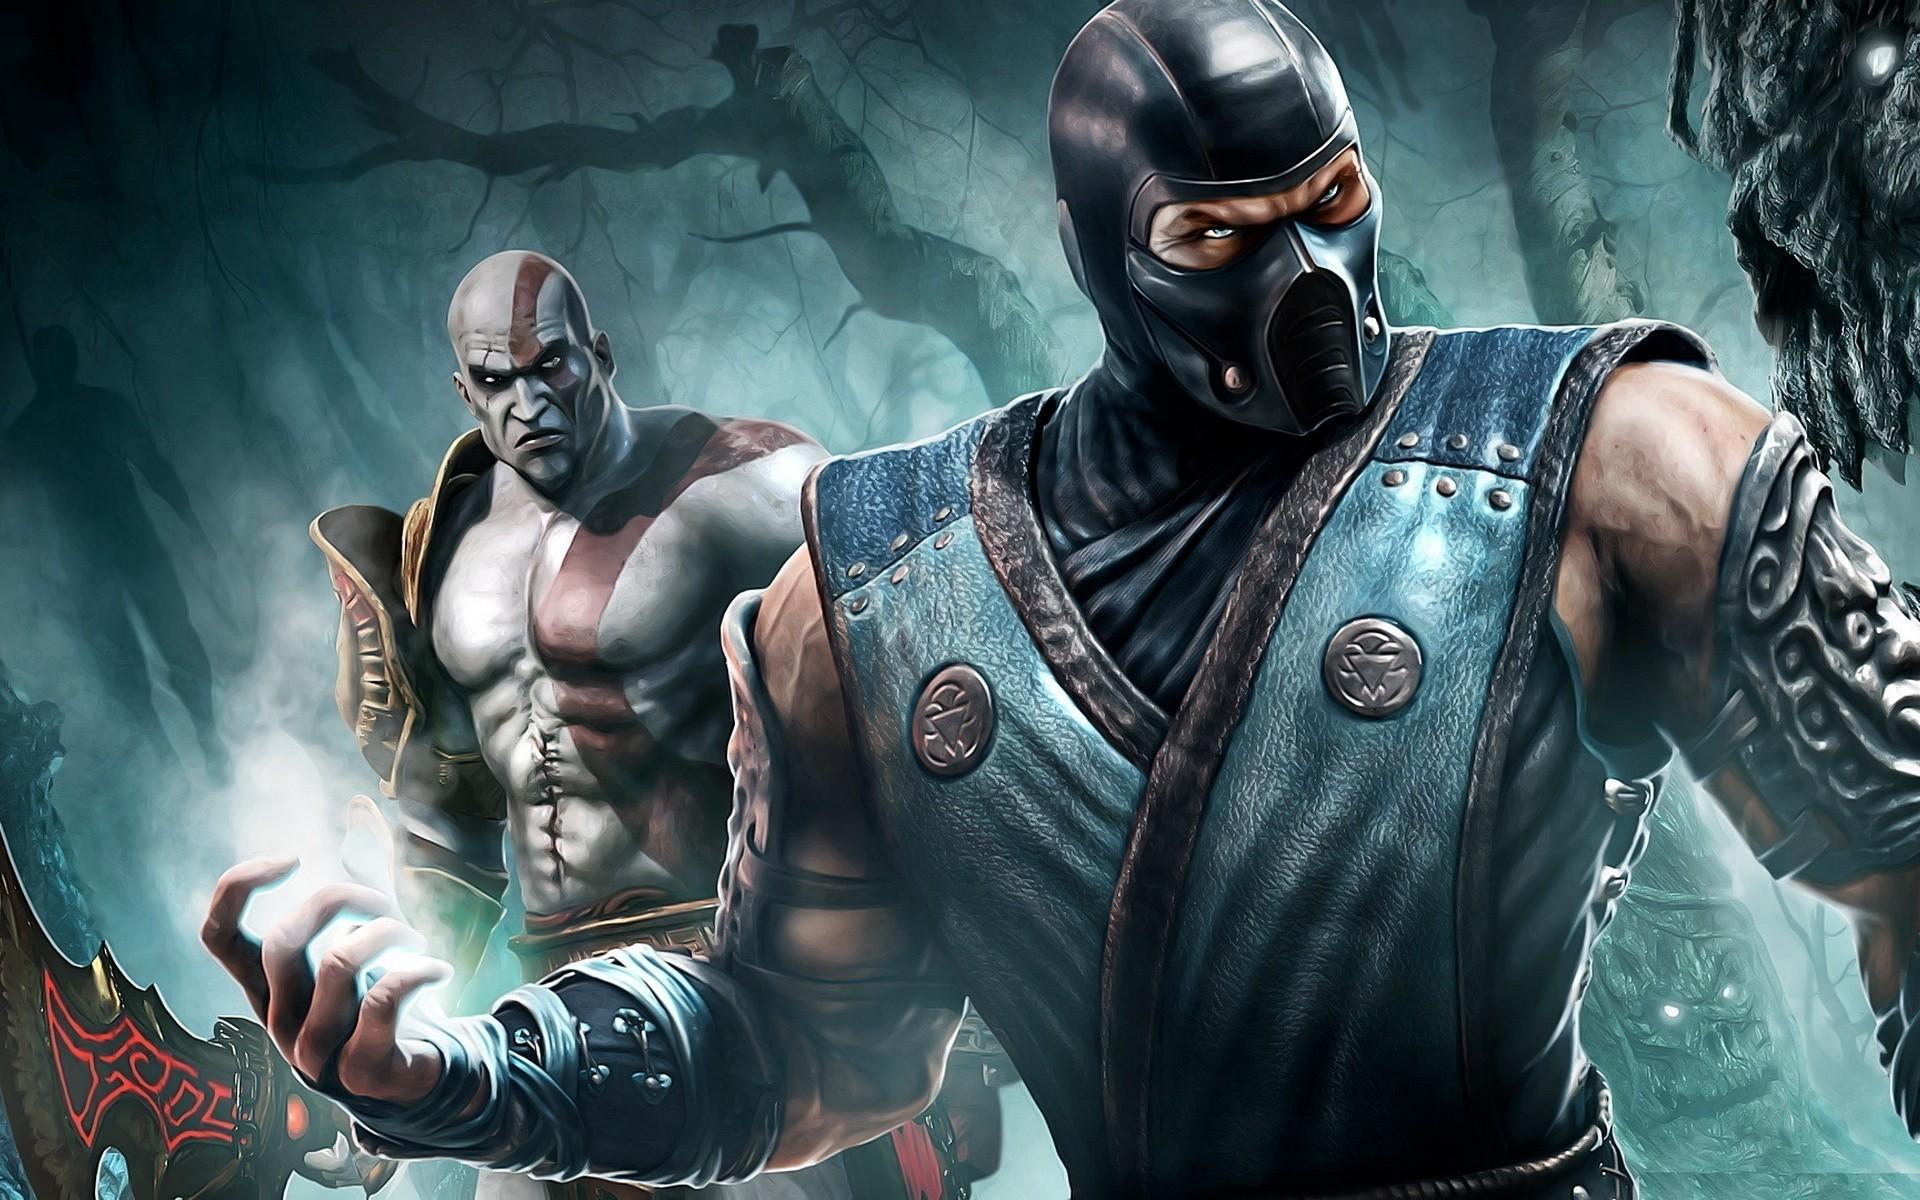 General 1920x1200 video games video game art Mortal Kombat Video Game Warriors Kratos God of War